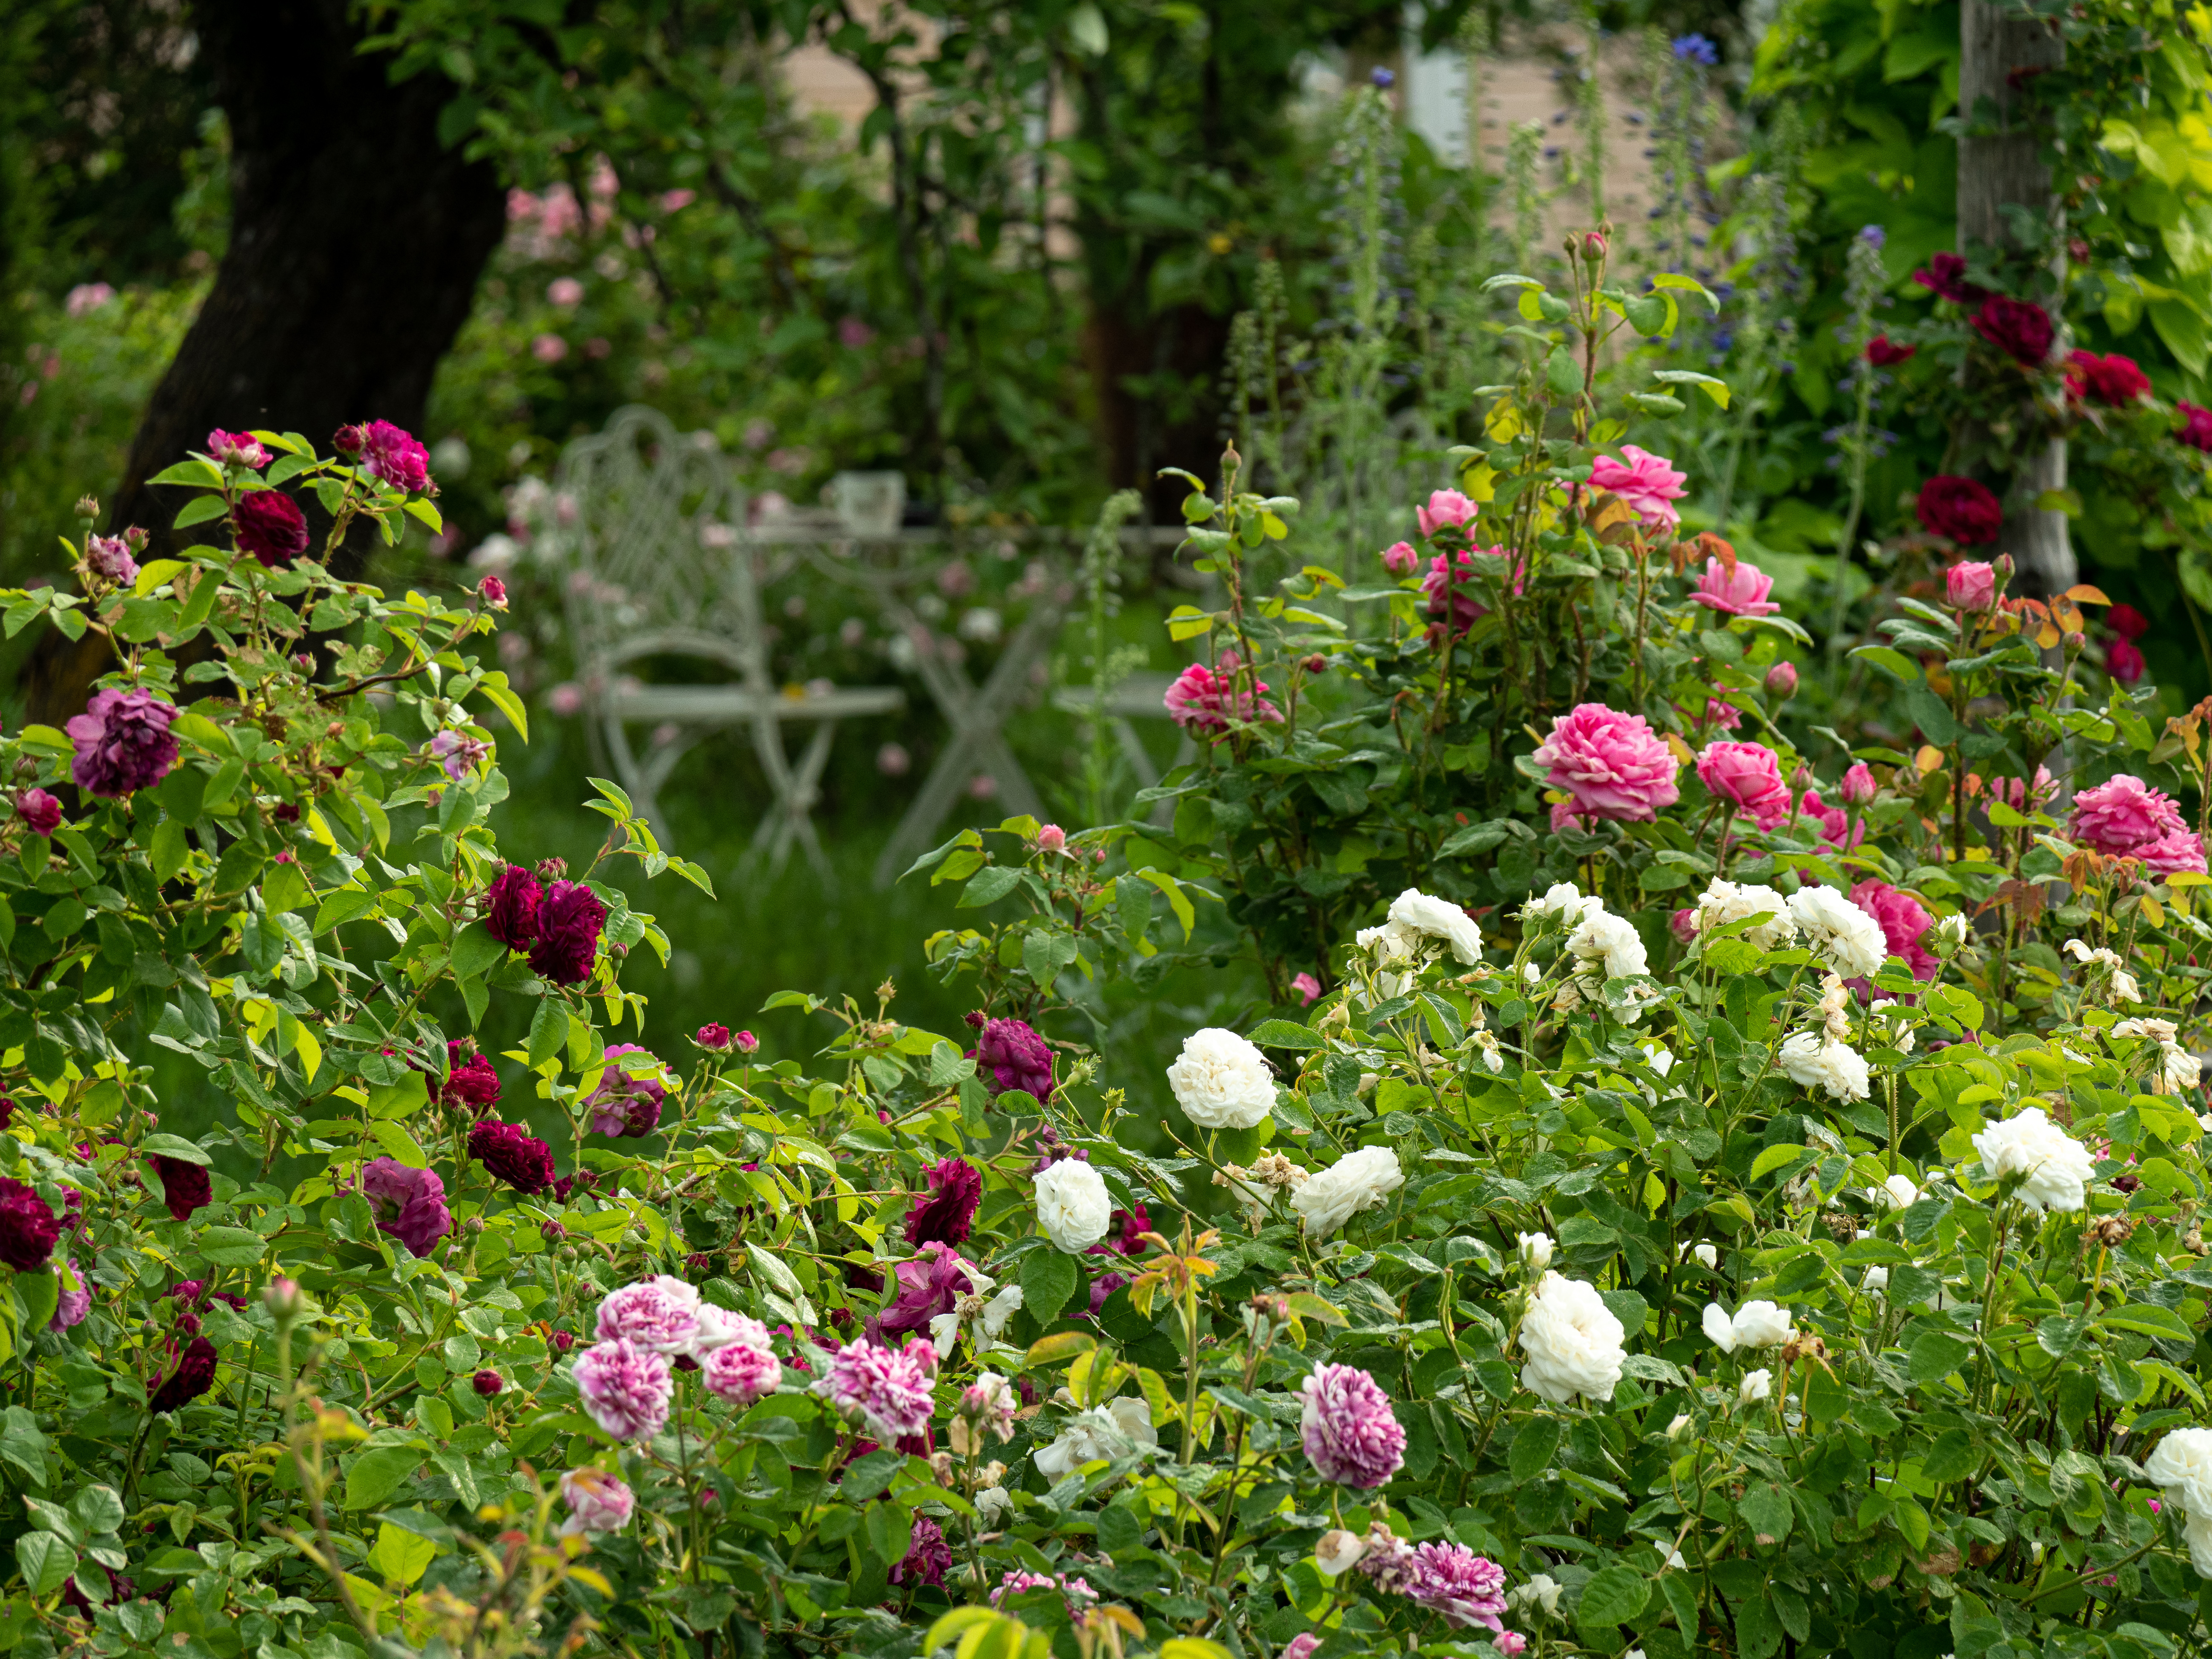 My Rose Garden in July #9